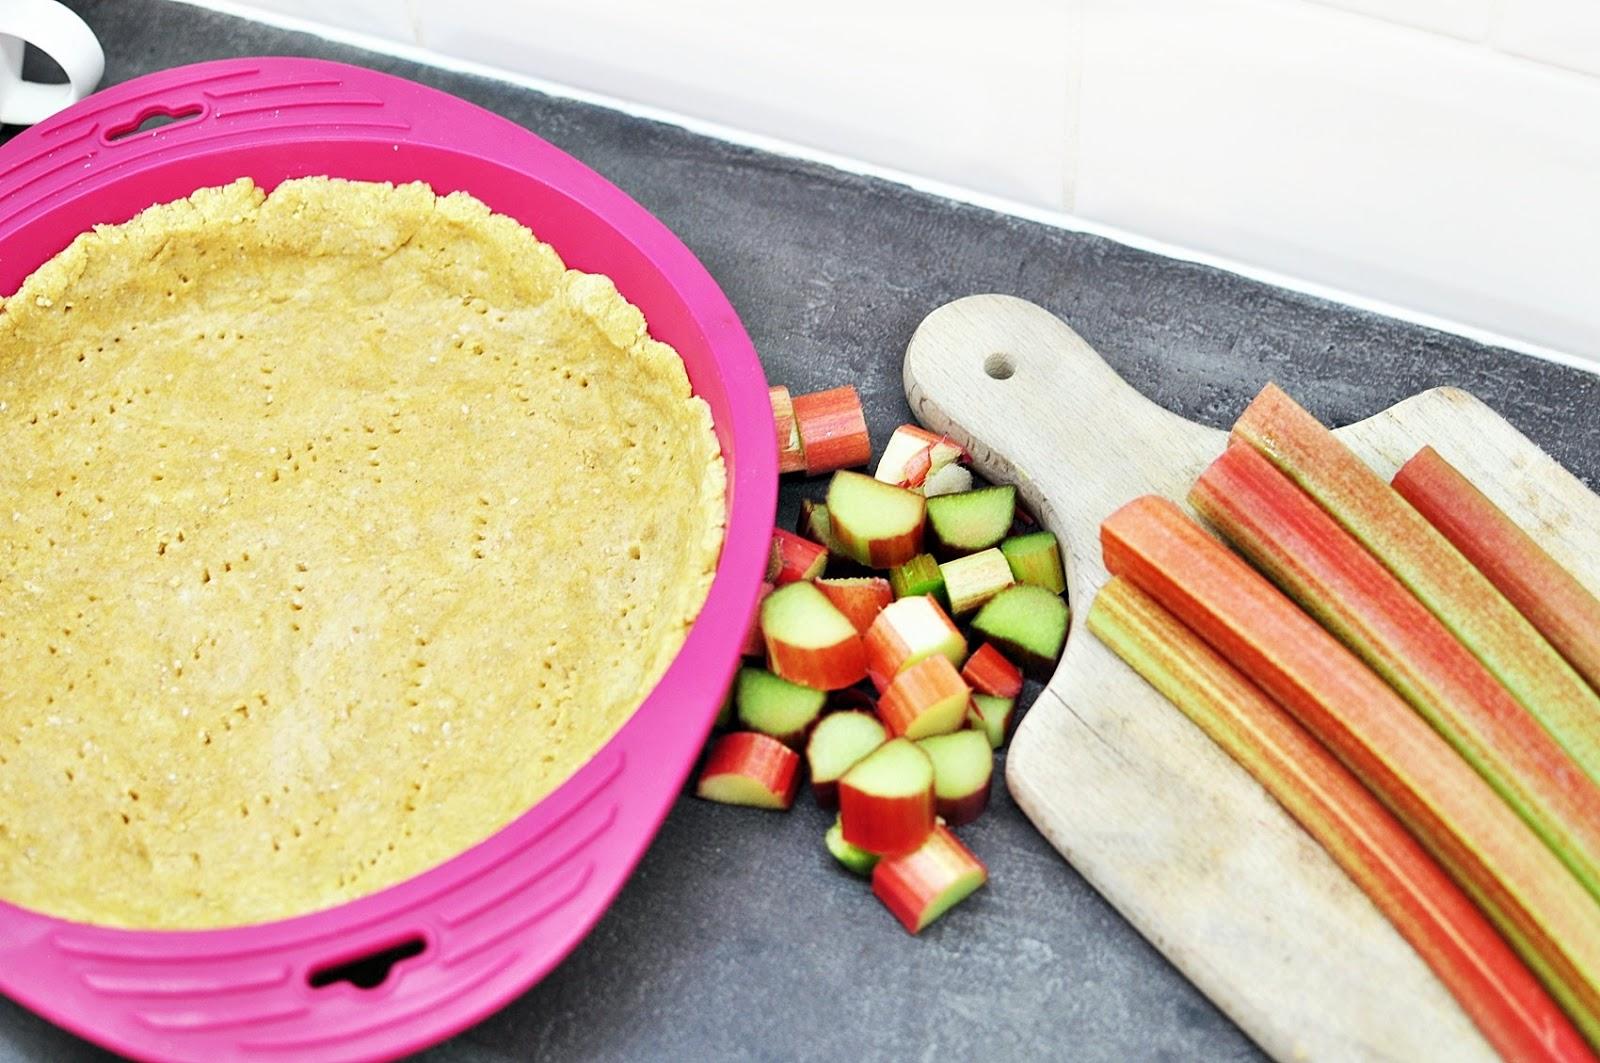 kruche-ciasto-z-owocami